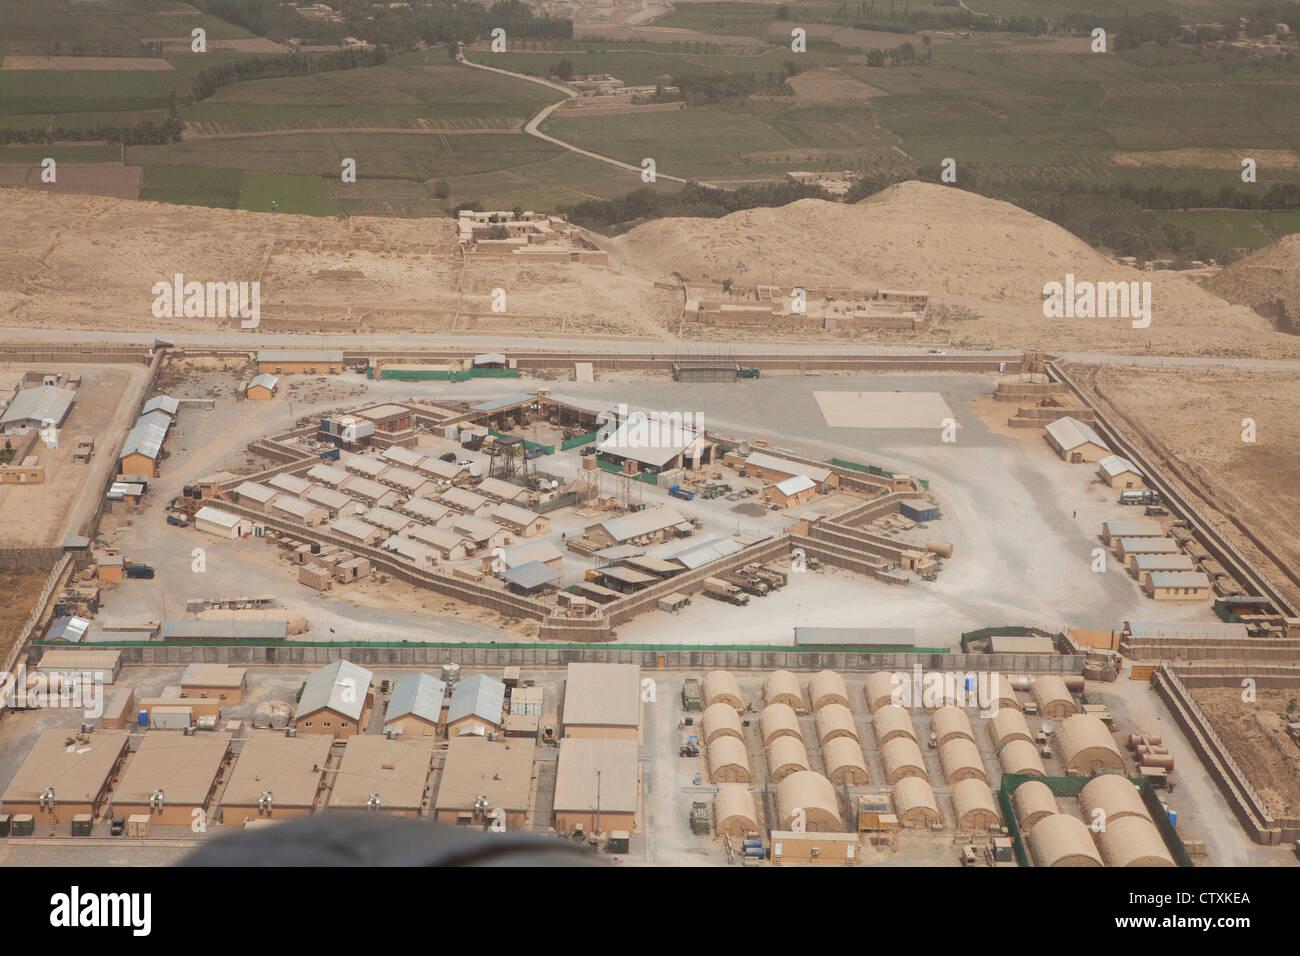 aerial view military base in Kunduz, Afghanistan. - Stock Image